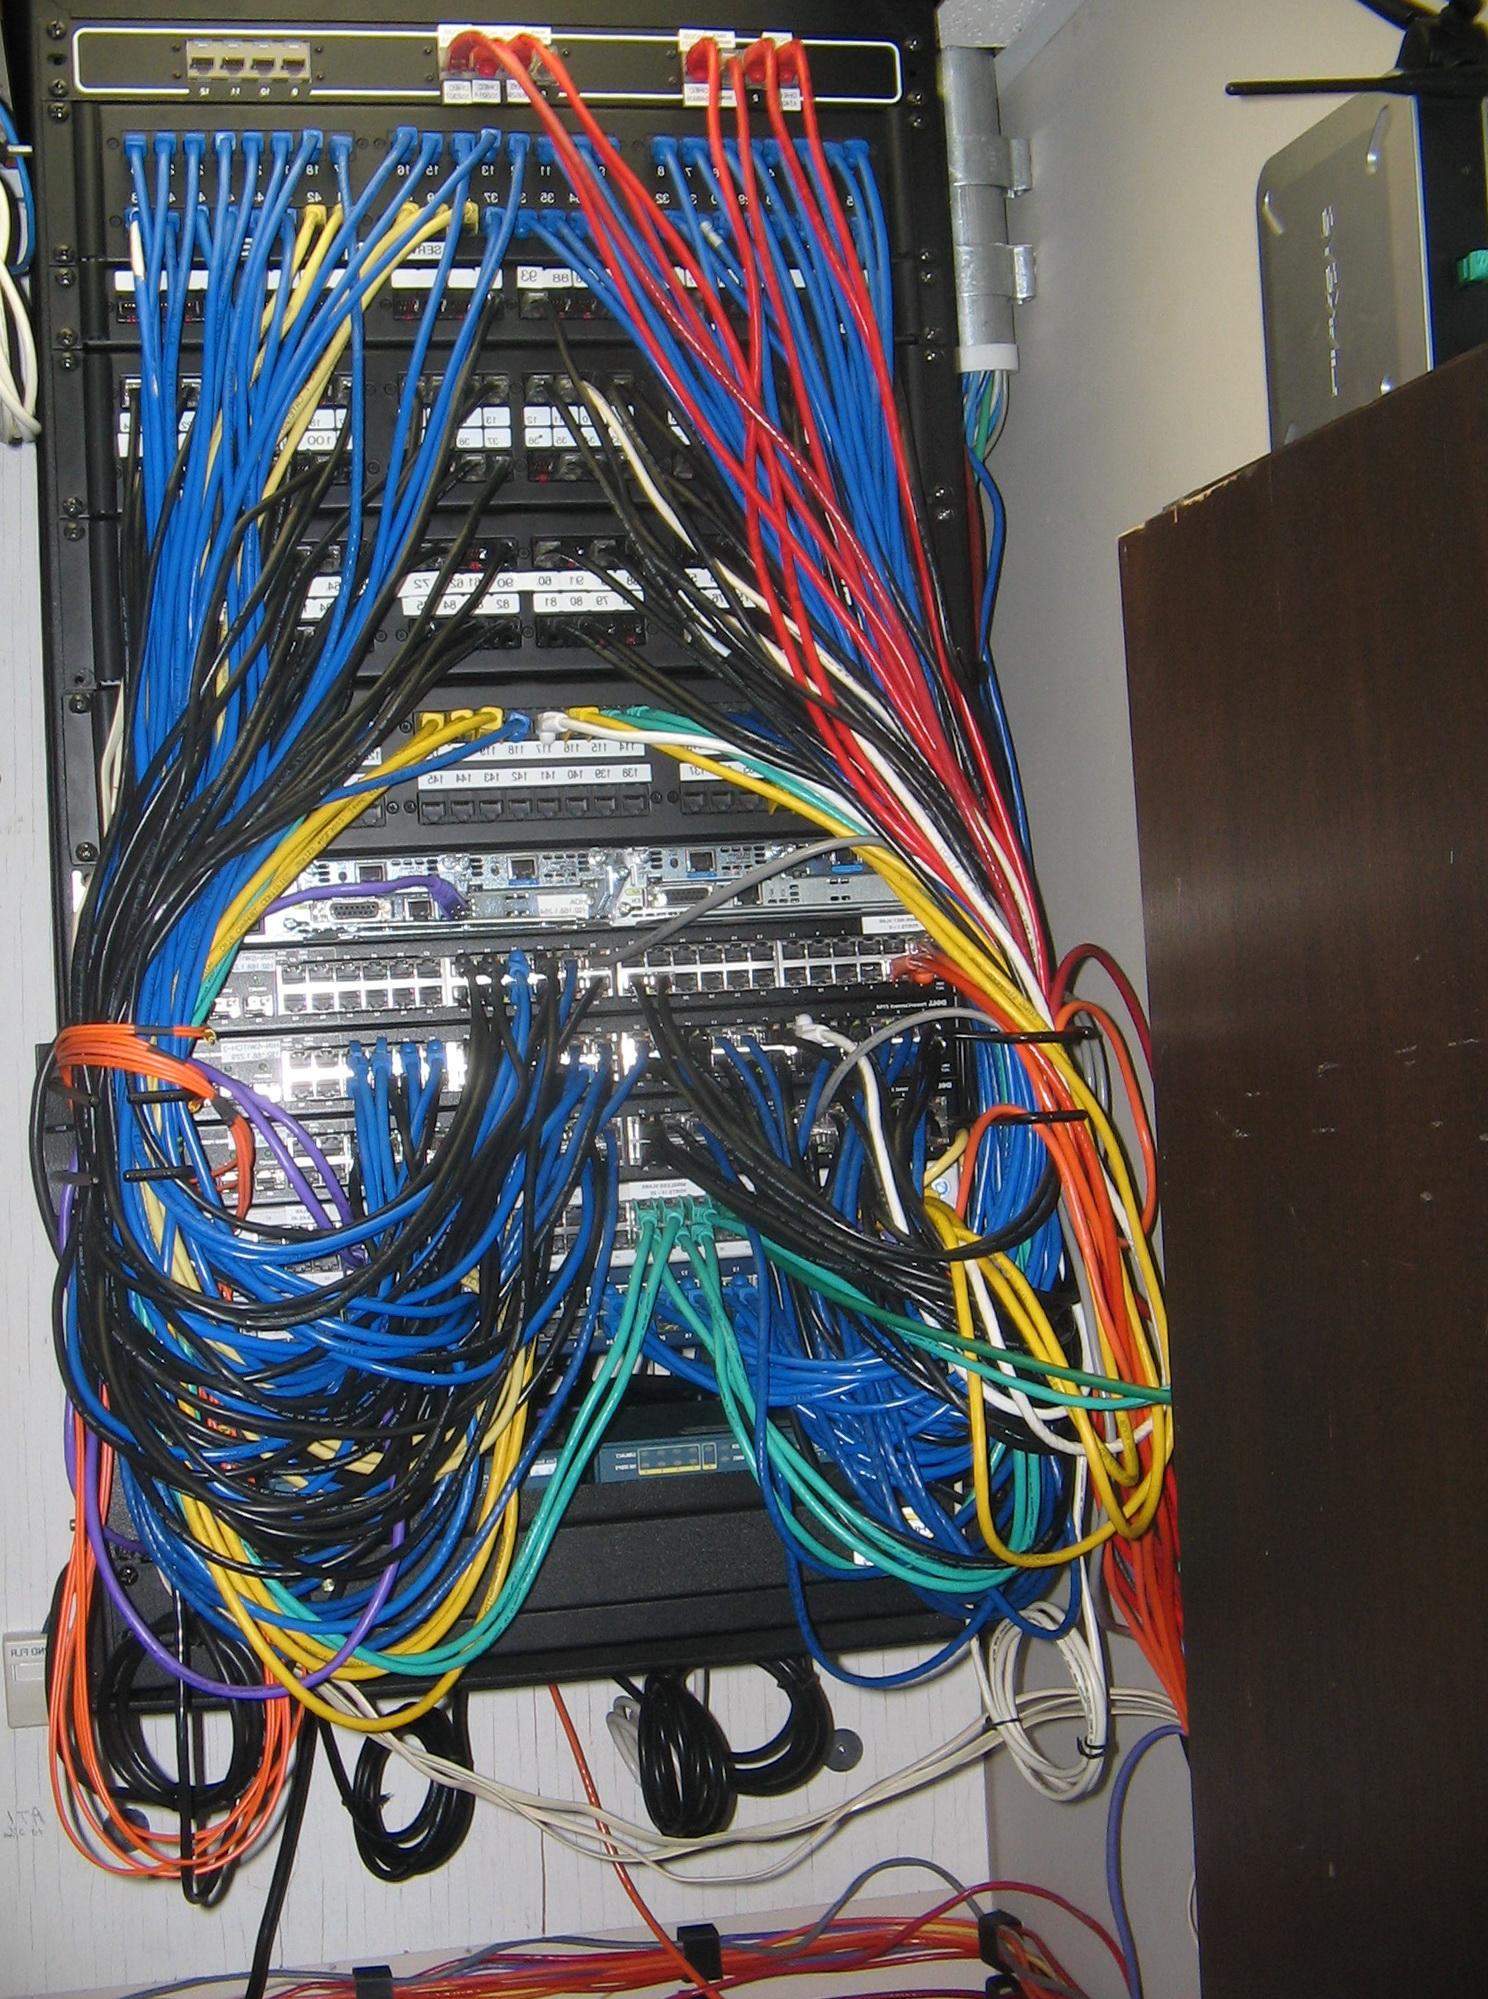 Home Network Wiring Closet Design Ideas Diagram